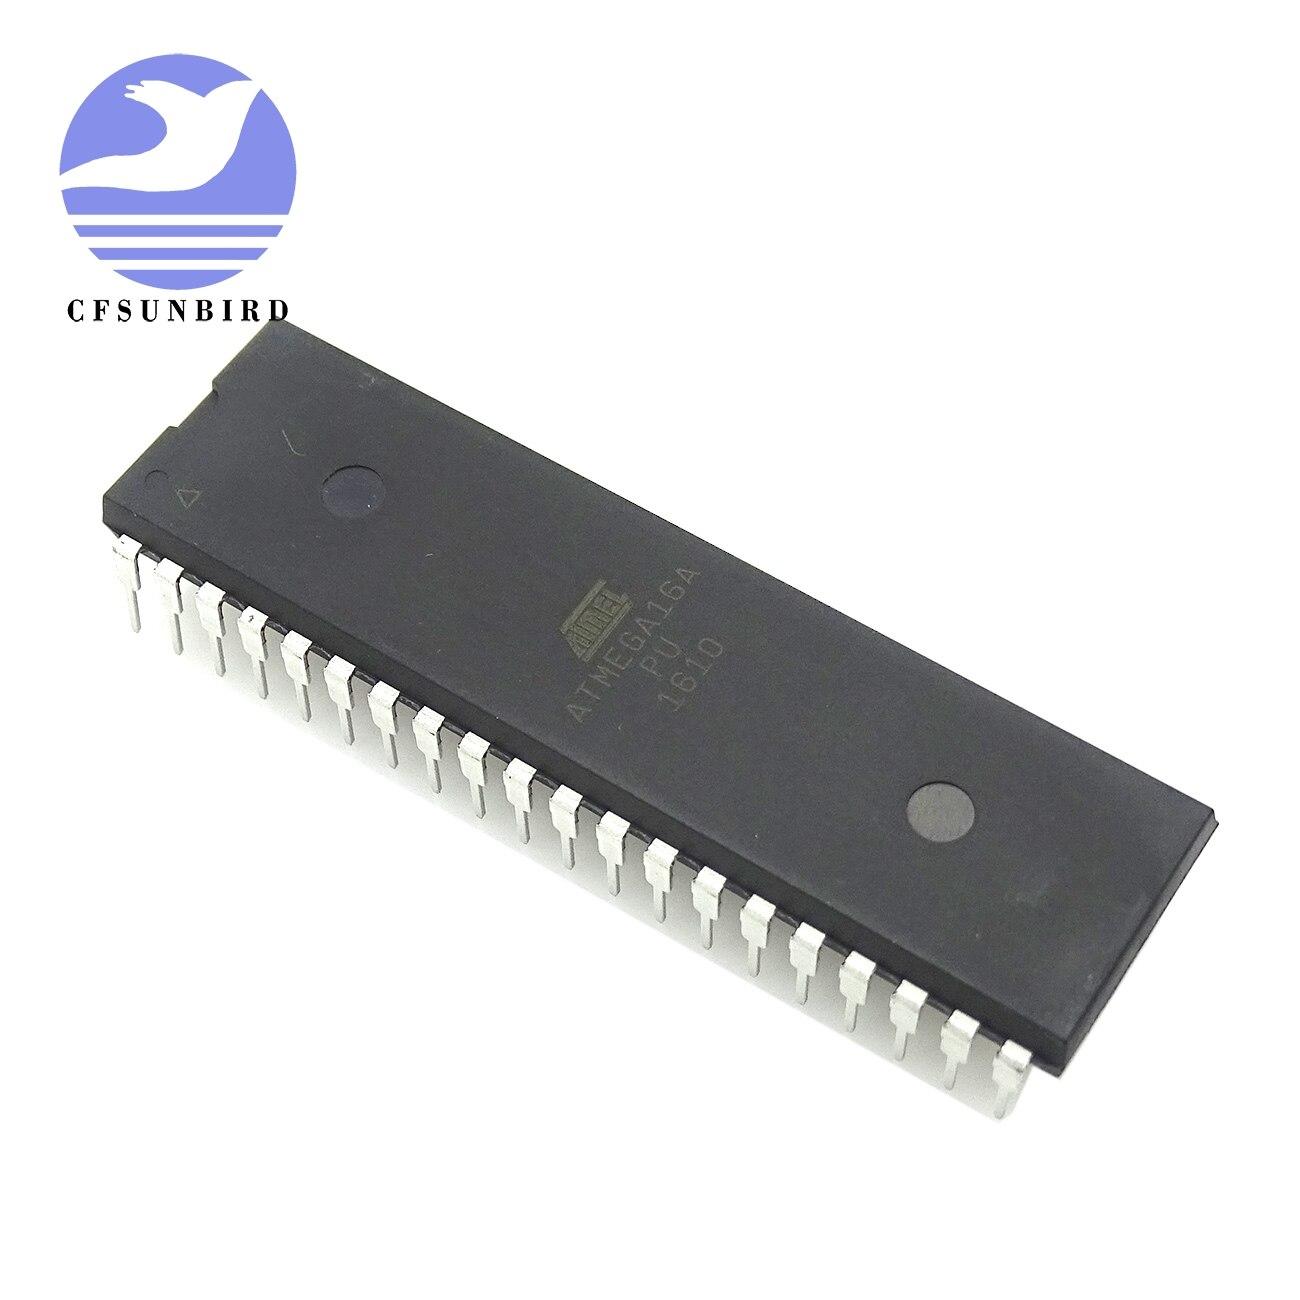 CFsunbird 1 pçs/lote ATMEGA16 ATMEGA16A-PU ATMEGA16A DIP-40